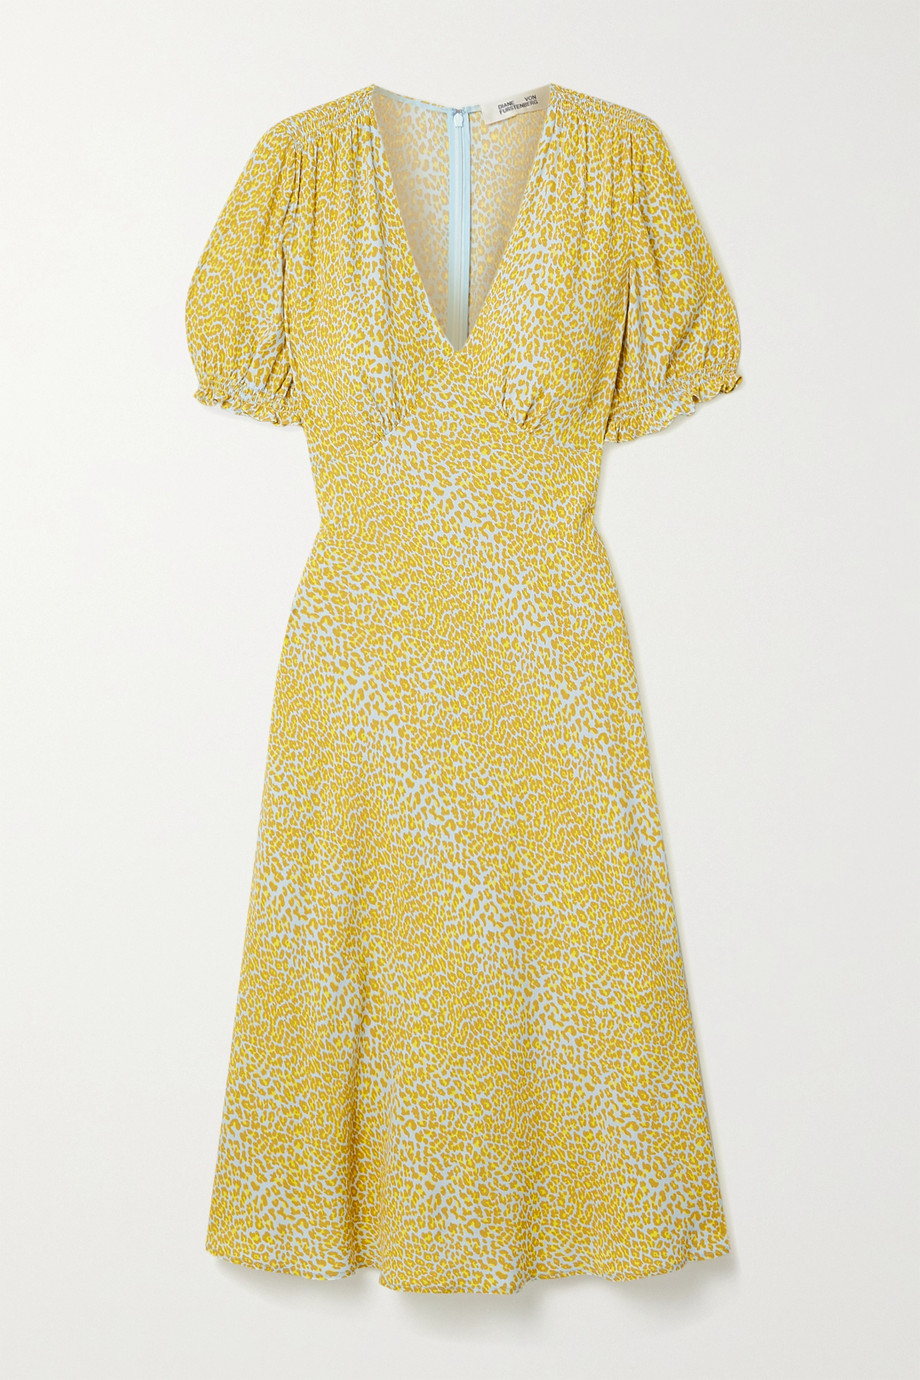 Diane von Furstenberg Idris leopard-print crepe midi dress